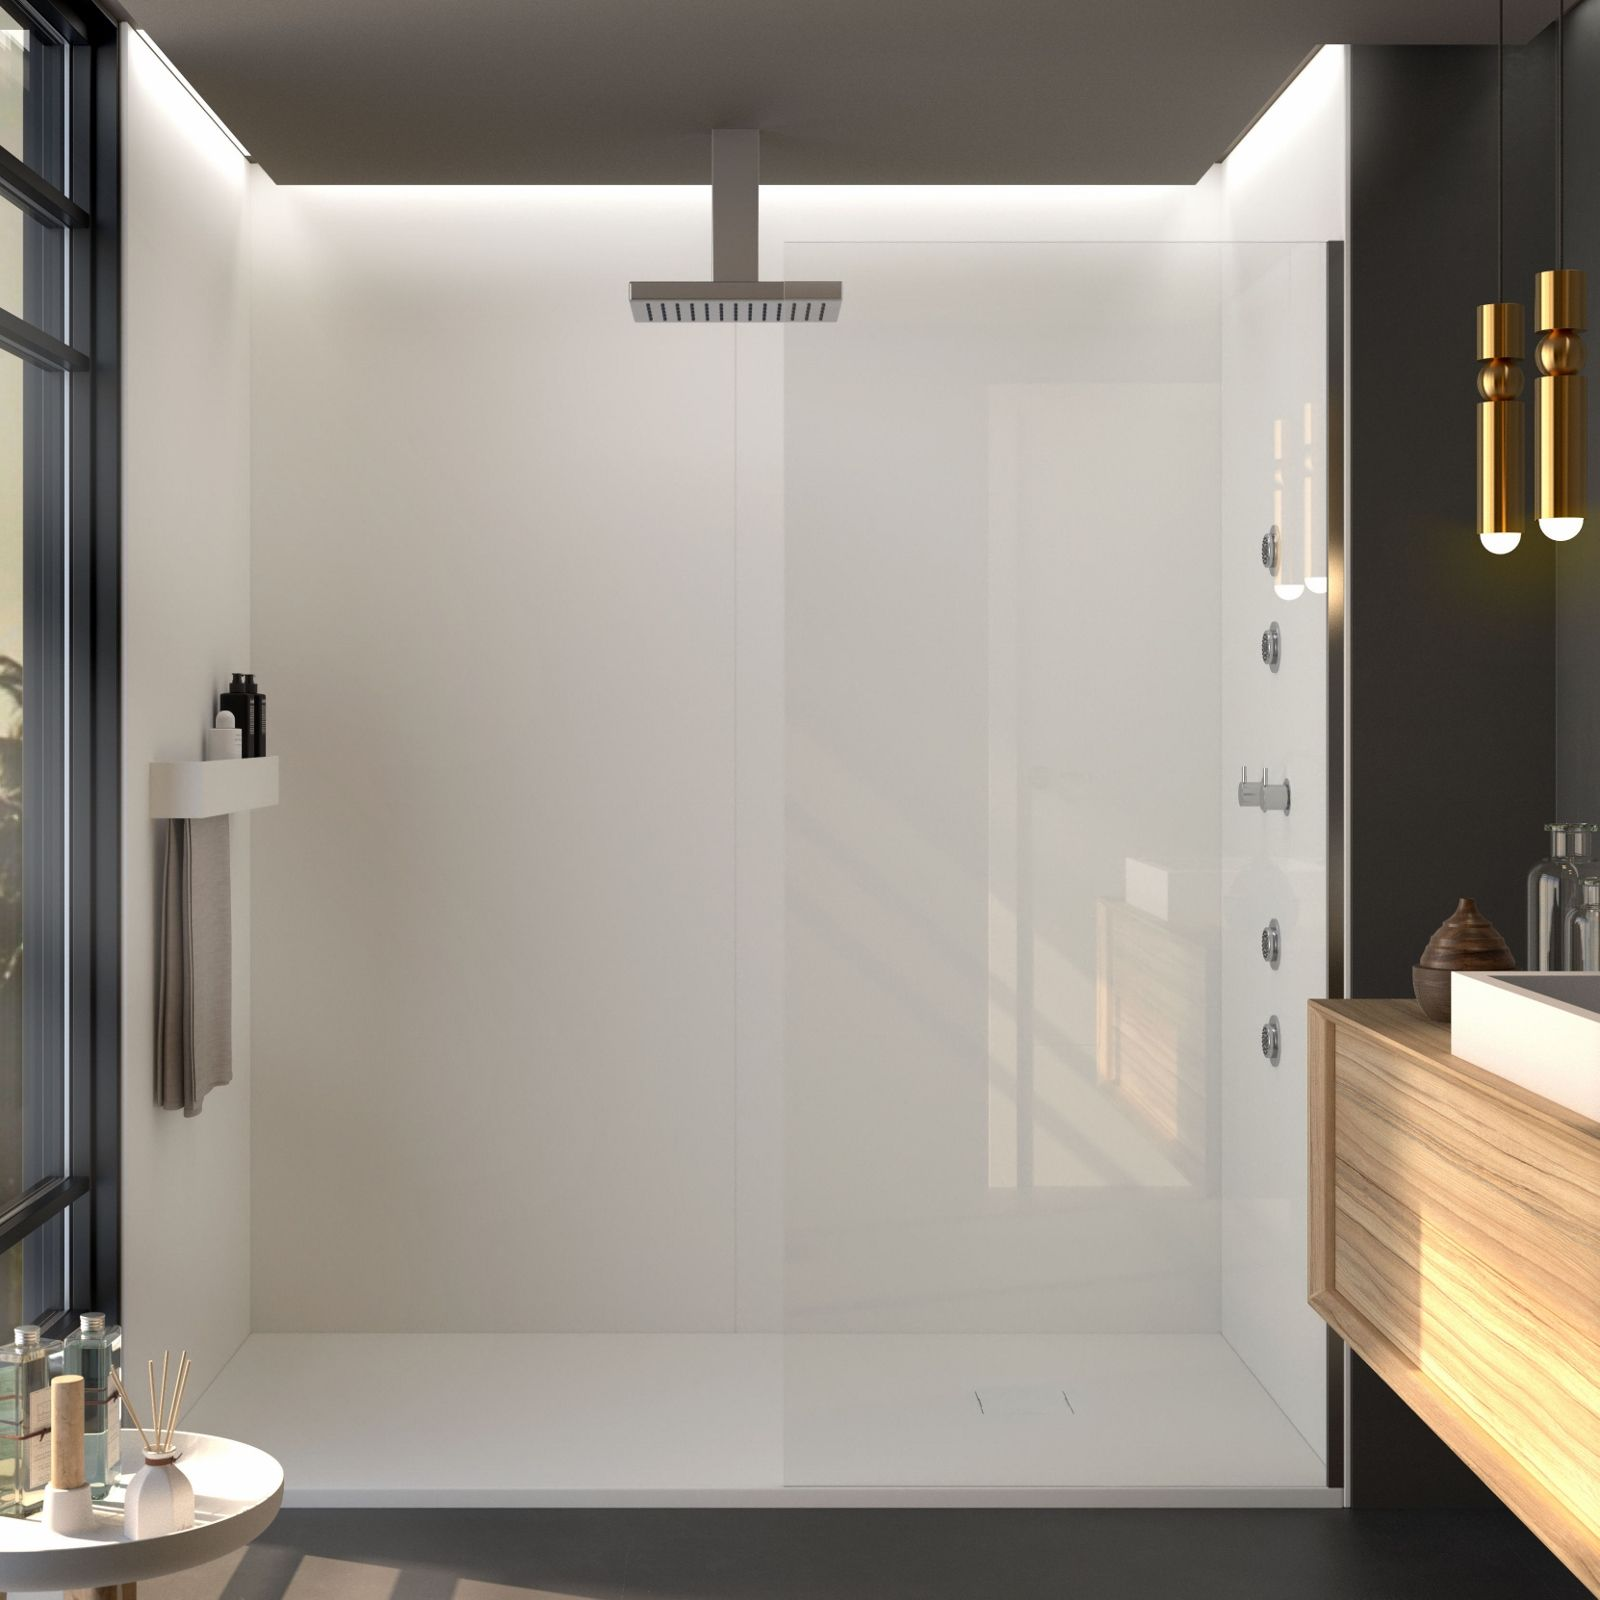 Dusche Ruckwand Fliesenersatz Mineralguss Liso Seda In 2020 Dusche Duschruckwand Badezimmer Design